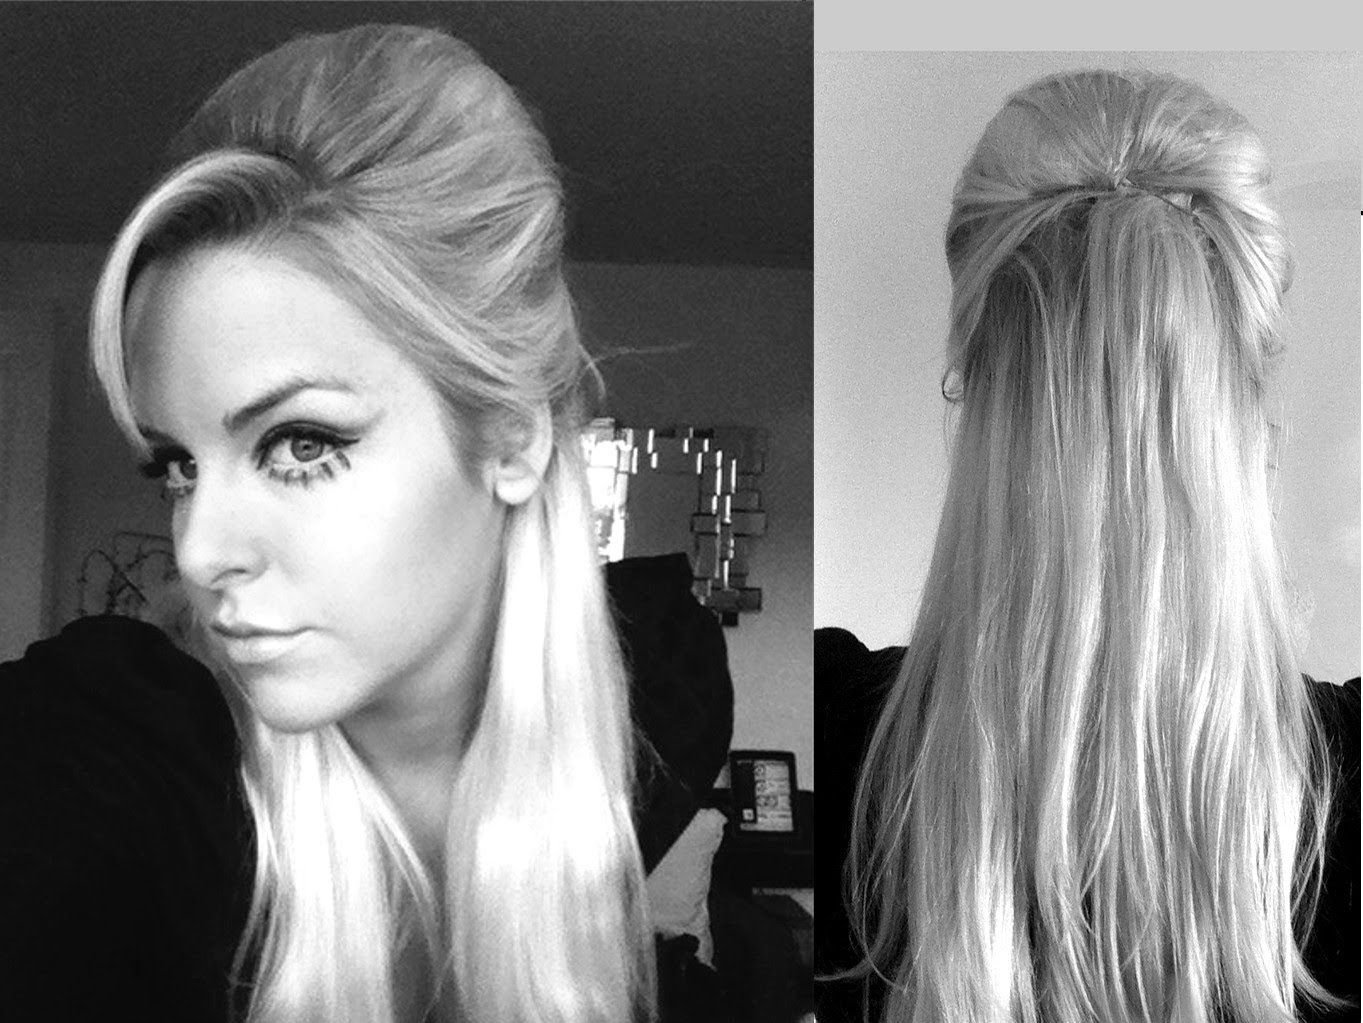 mod 60's beehive hair style | oh la la beautiful! | pinterest